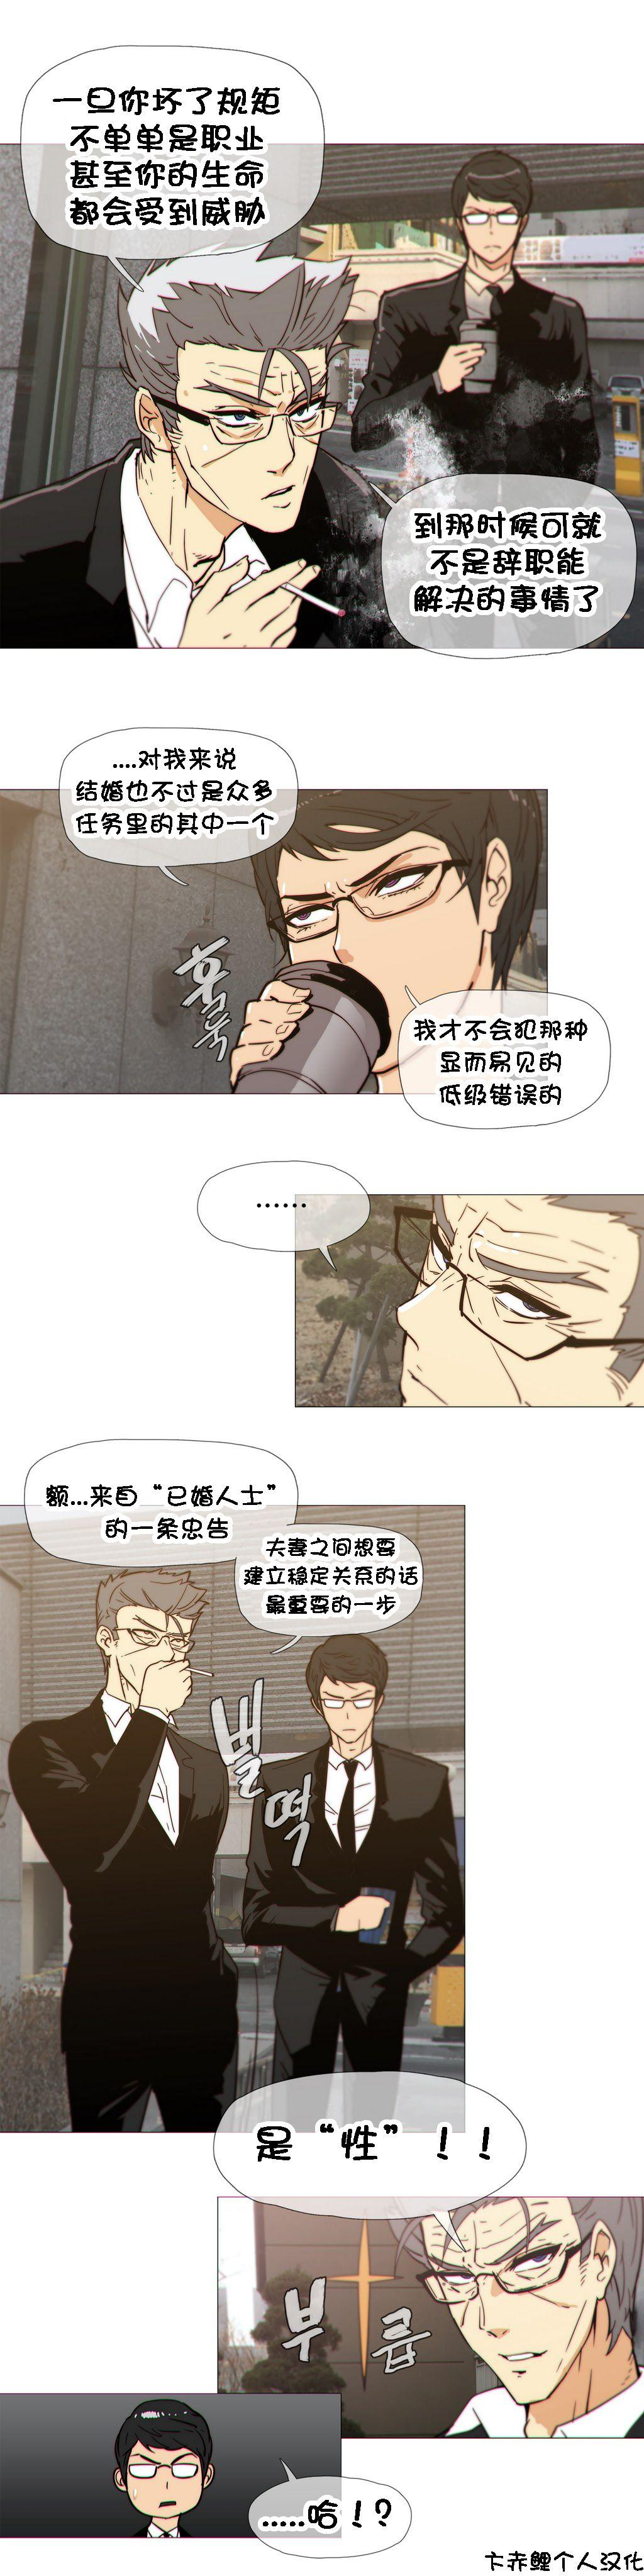 HouseHold Affairs 【卞赤鲤个人汉化】1~33话(持续更新中) 526